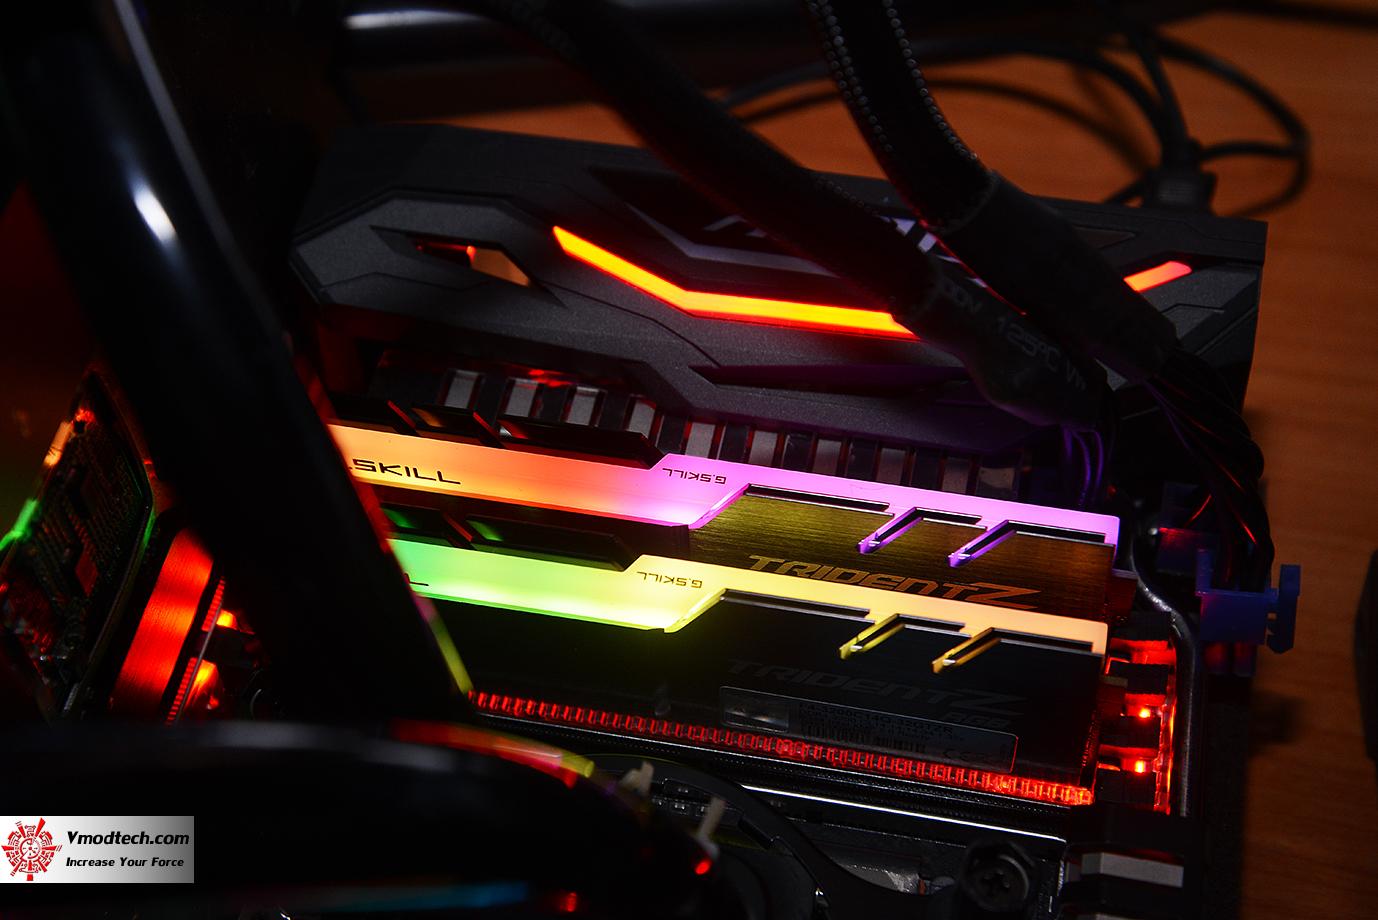 dsc 2990 G.SKILL Trident Z RGB DDR4 3200MHz 32GB (8GBx4) Quad Channel Review